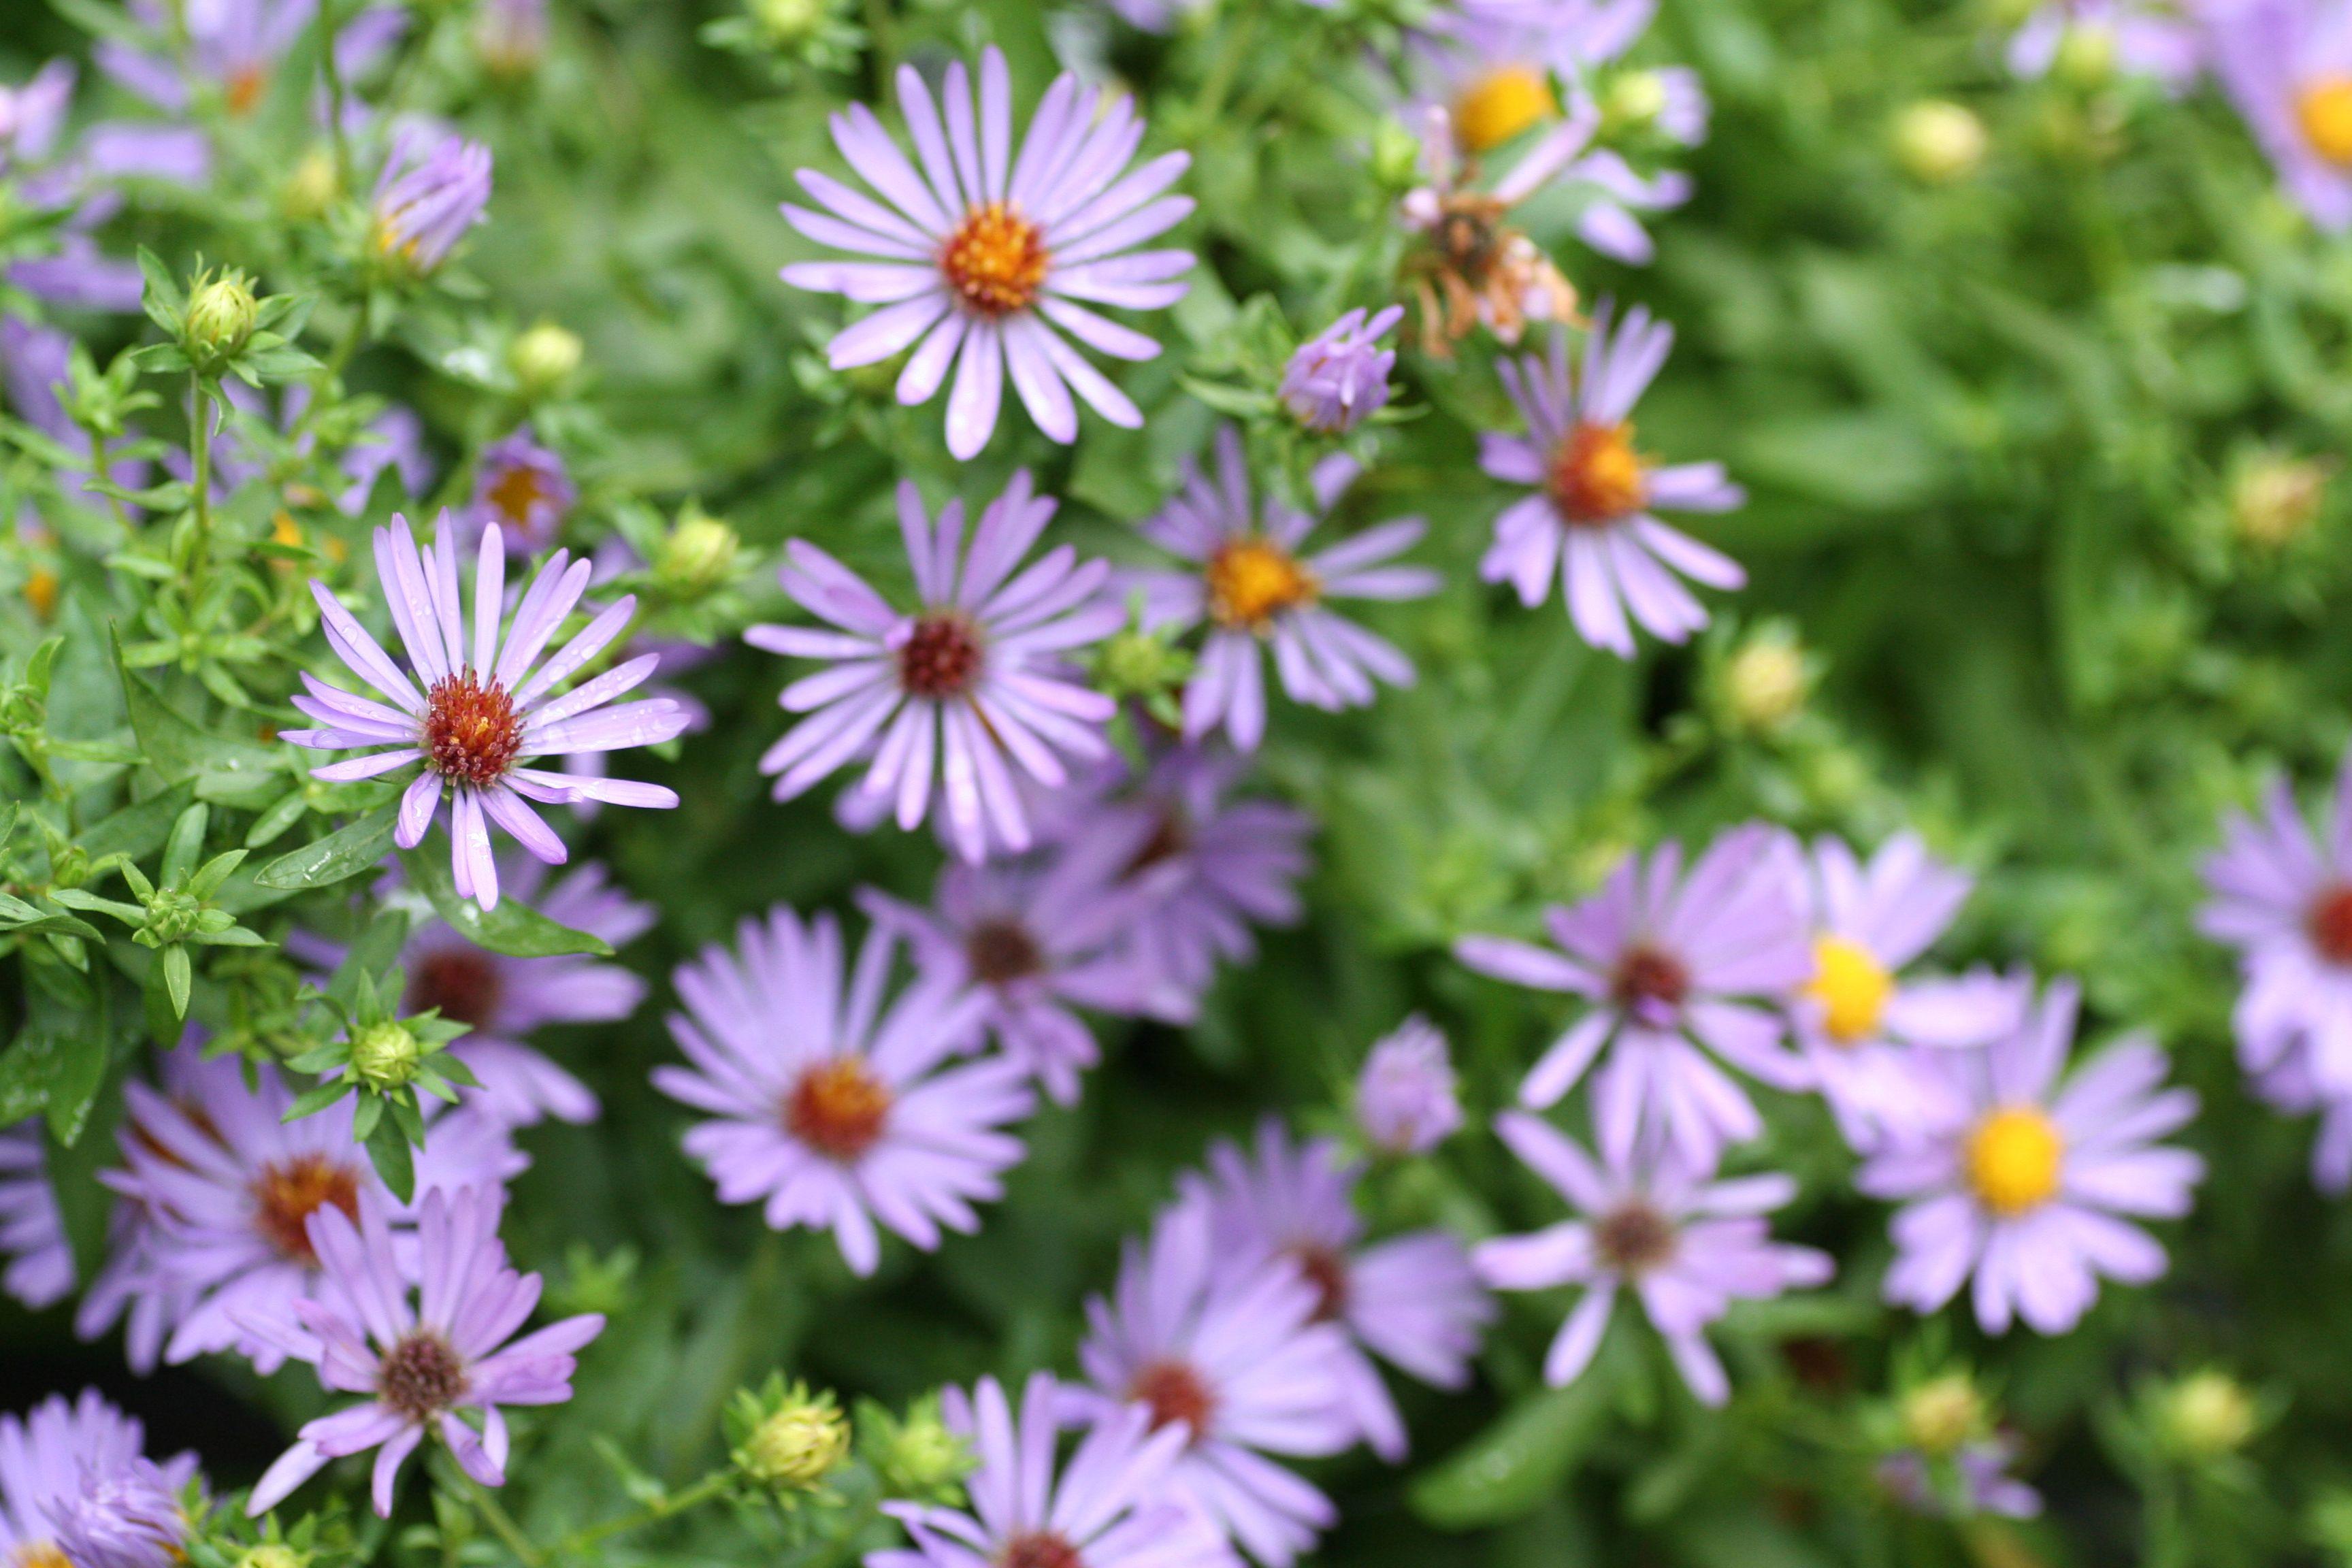 Flowers For Honey Bees Late Summer Flowers Summer Flowers Garden Bees Plants